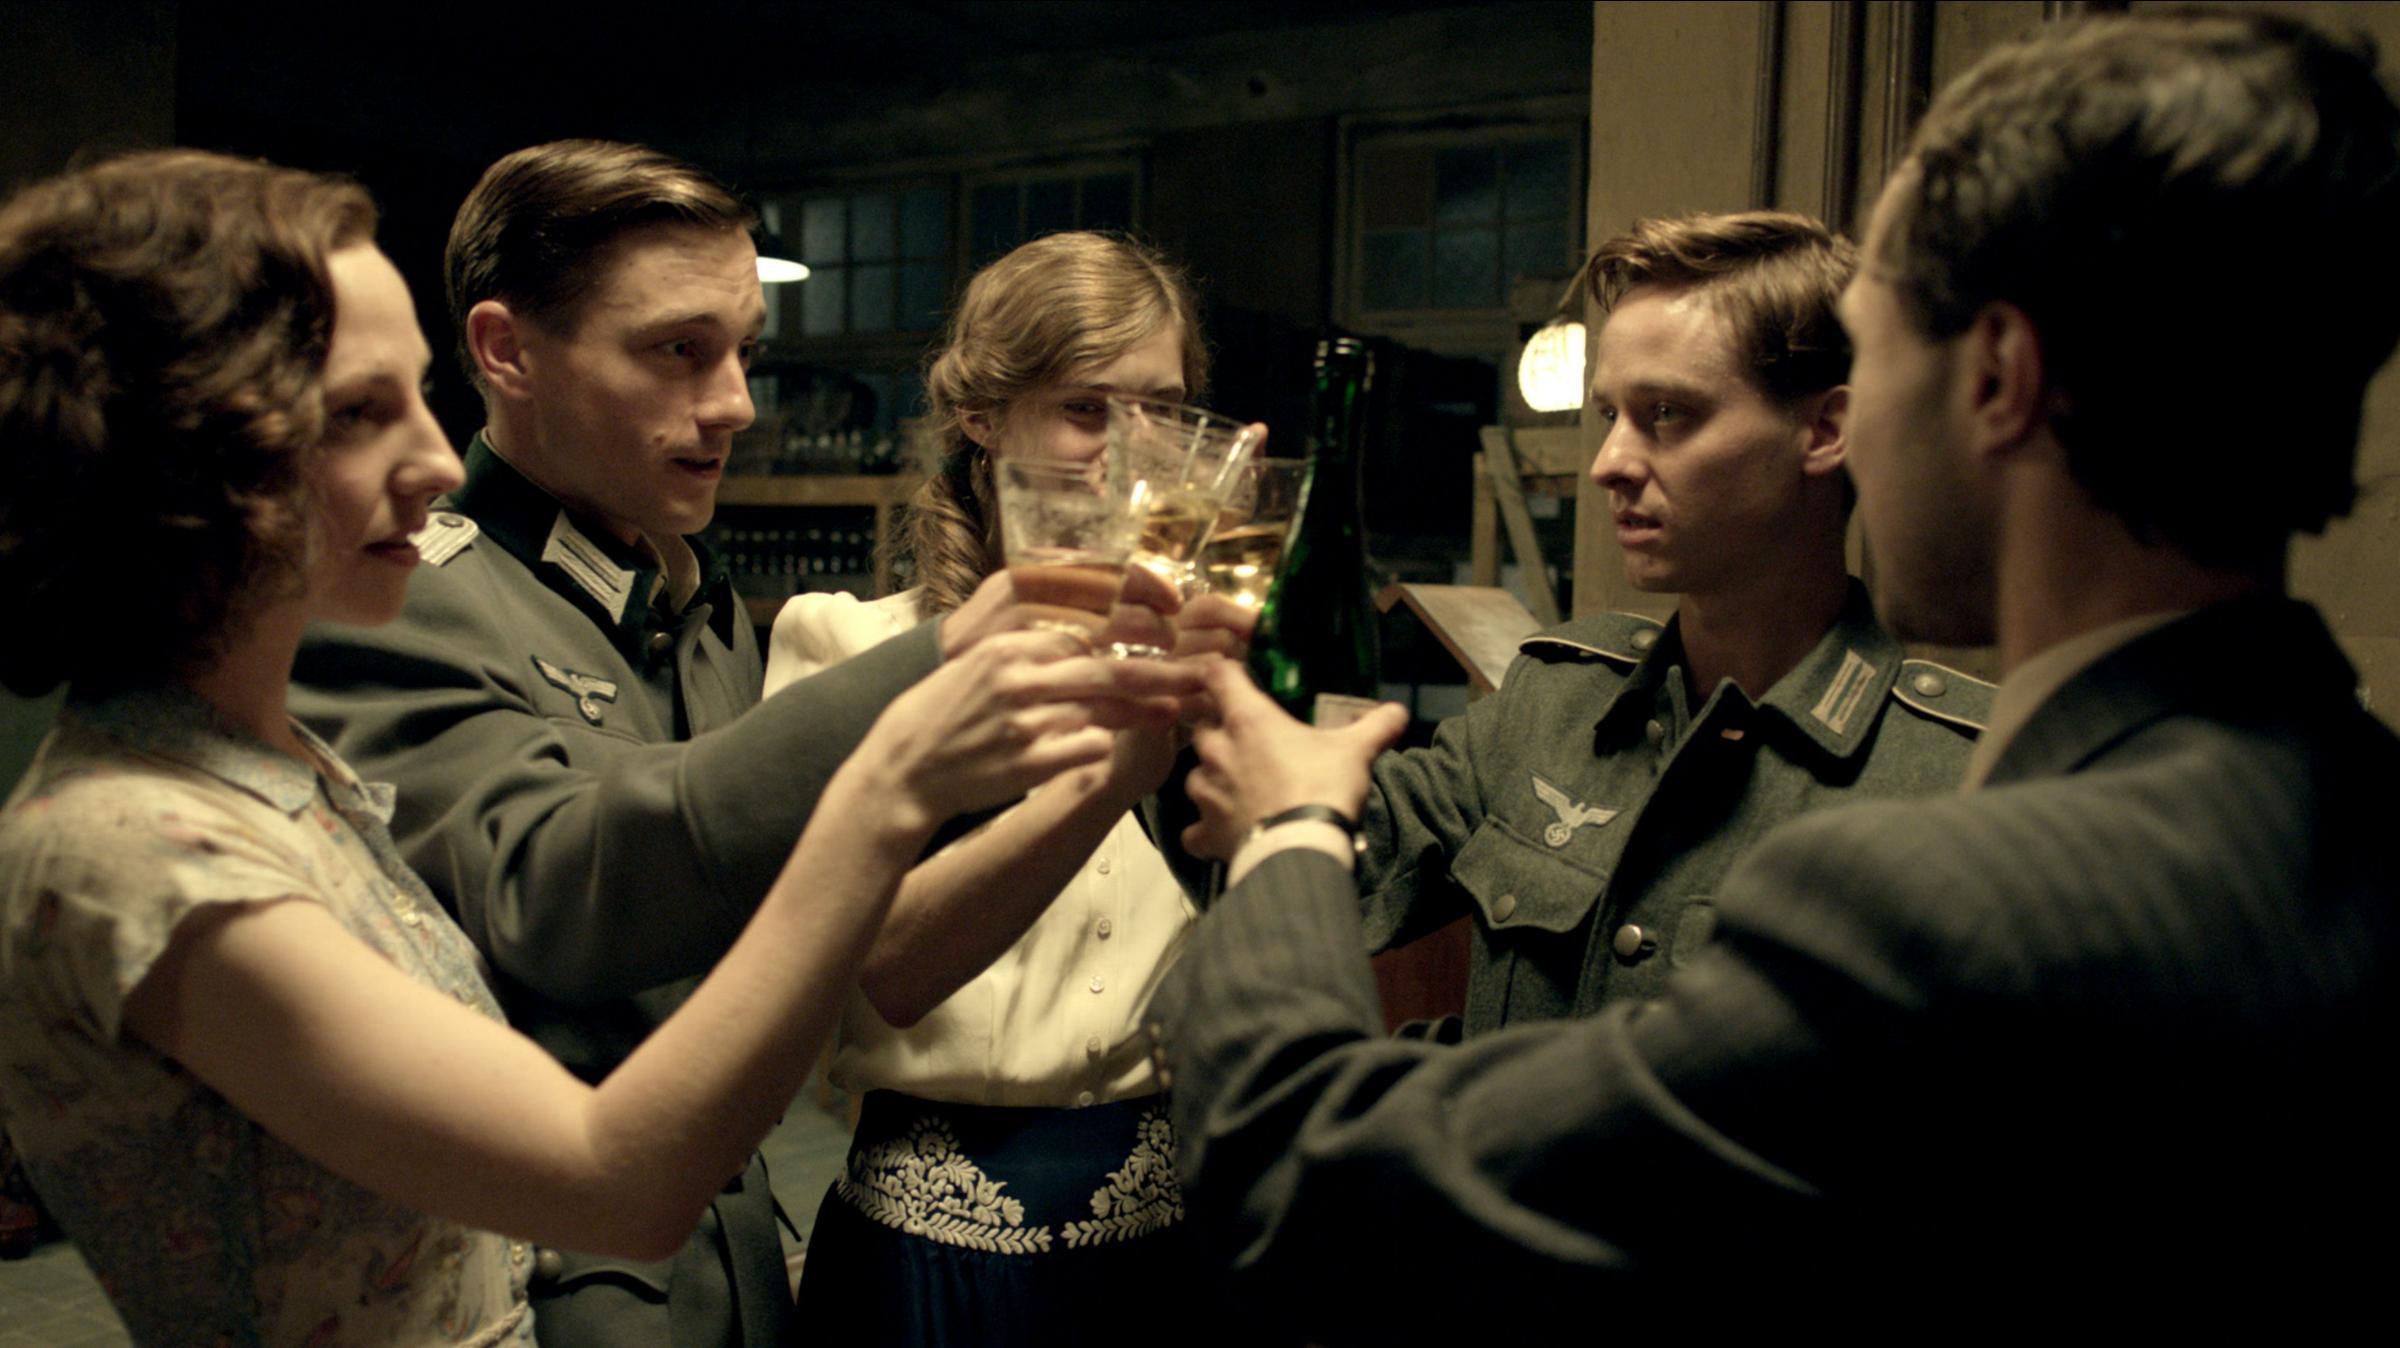 10 great films about women in wartime